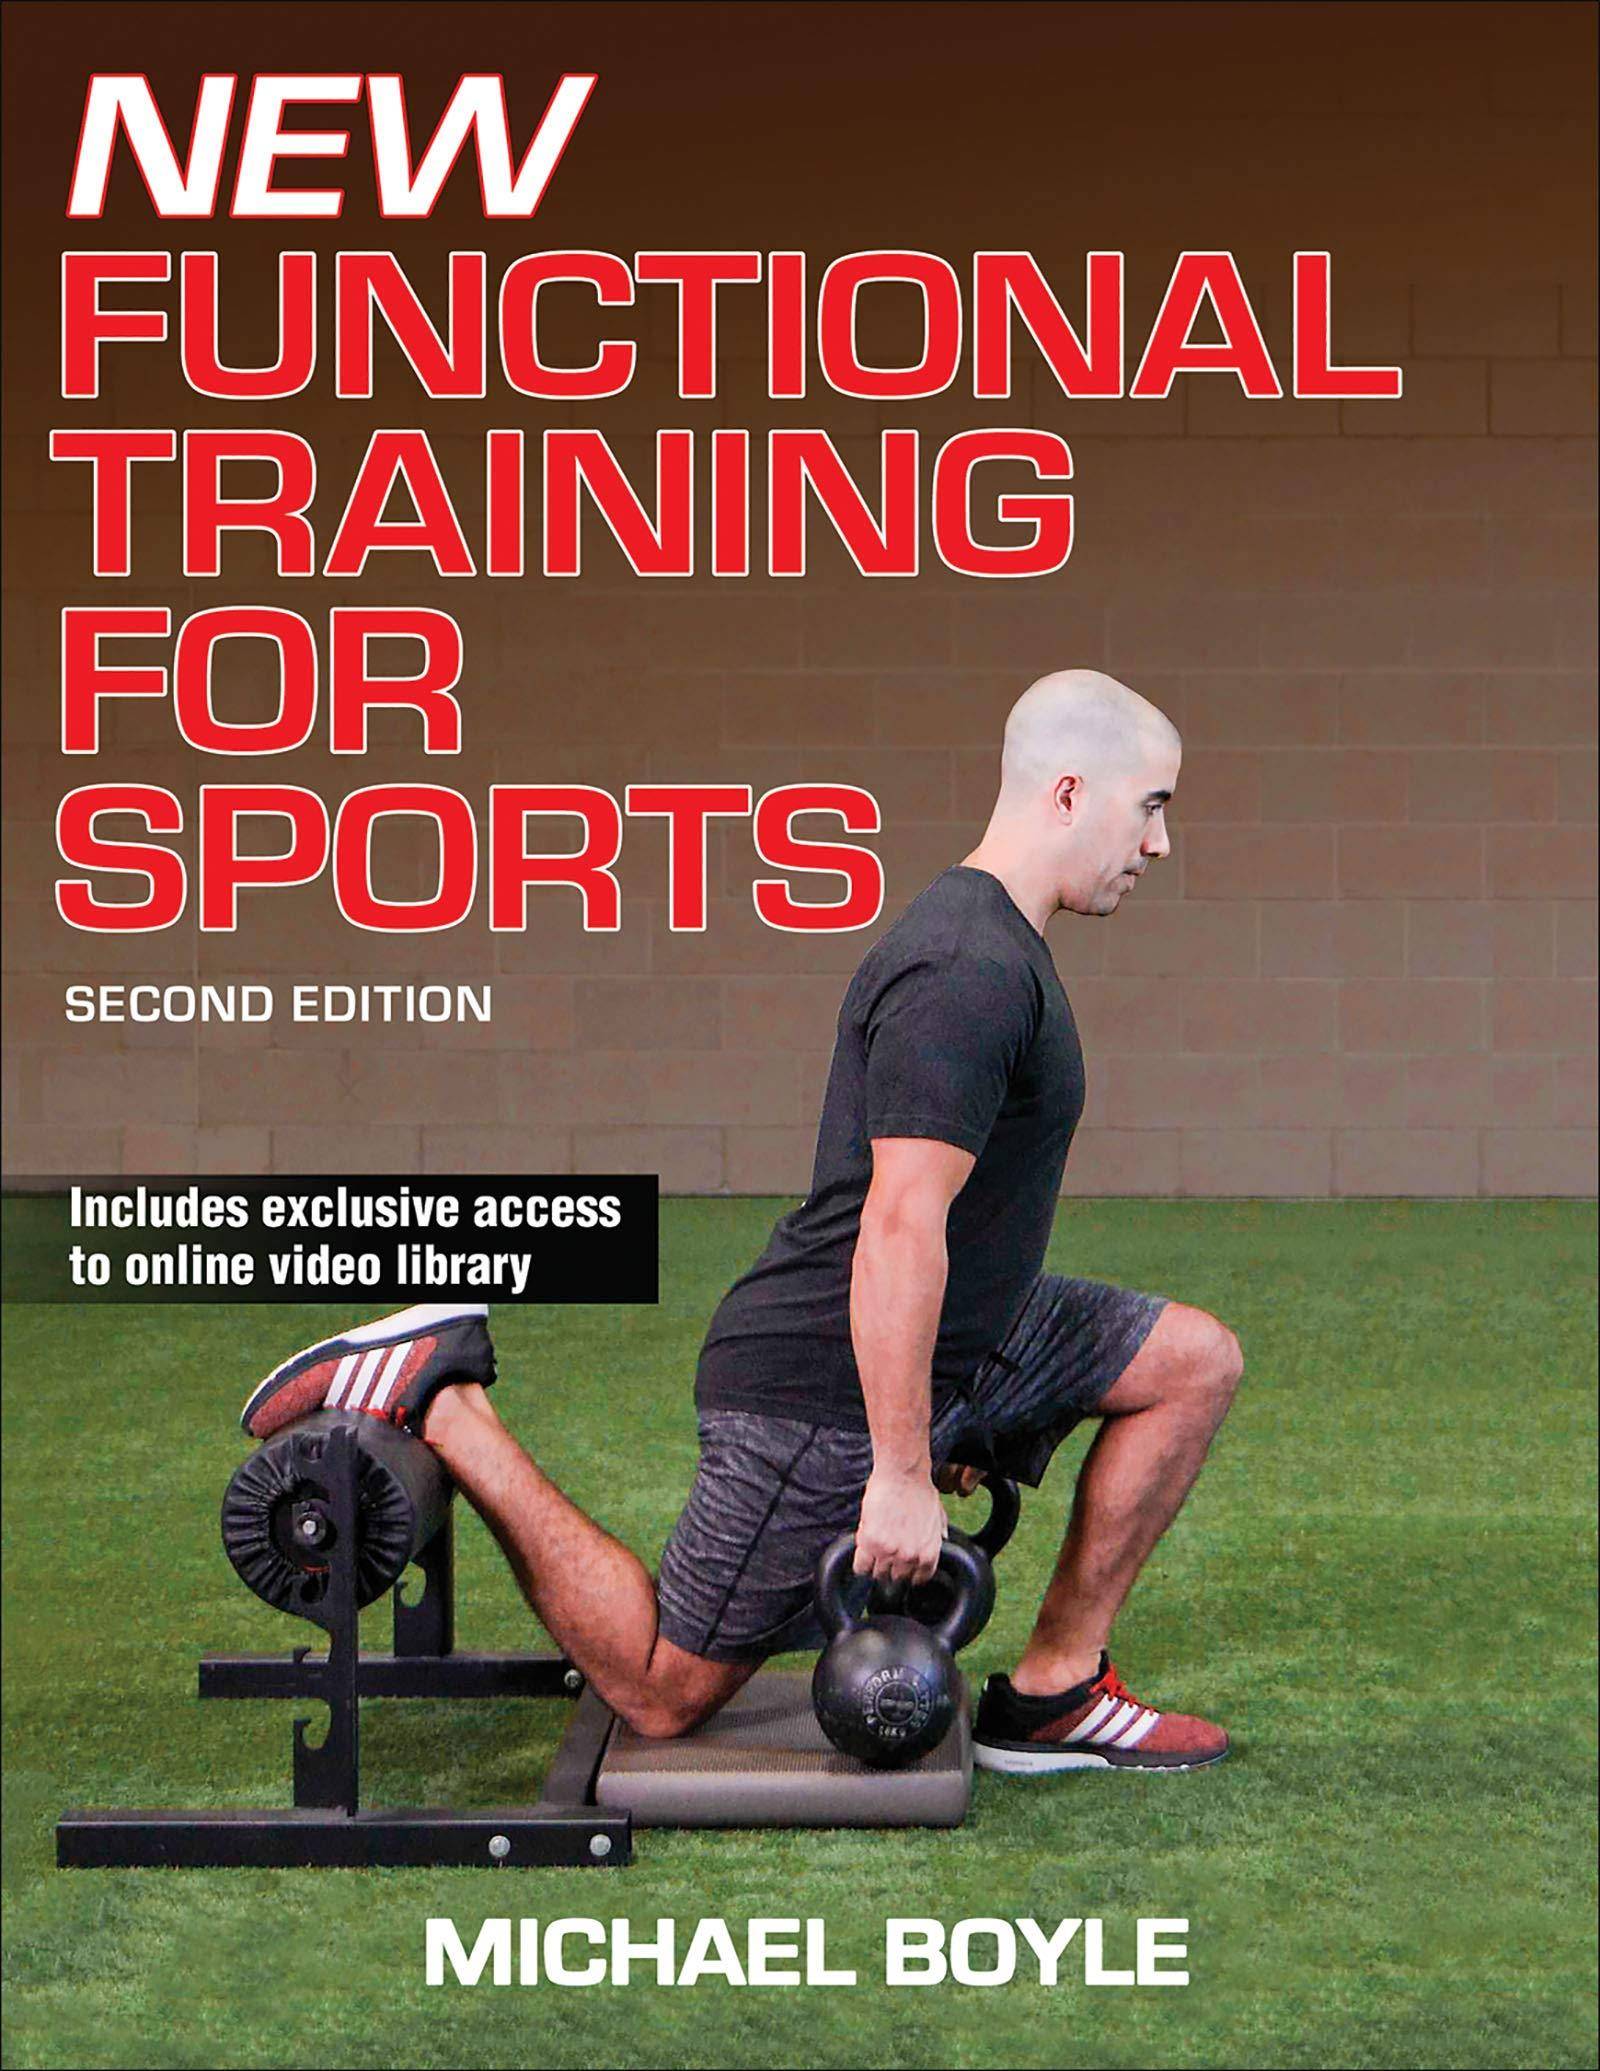 FUNCTIONAL TRAINING for SPORTS [2nd Edition]. Fitness - Ασκήσεις φυσικής κατάστασης -